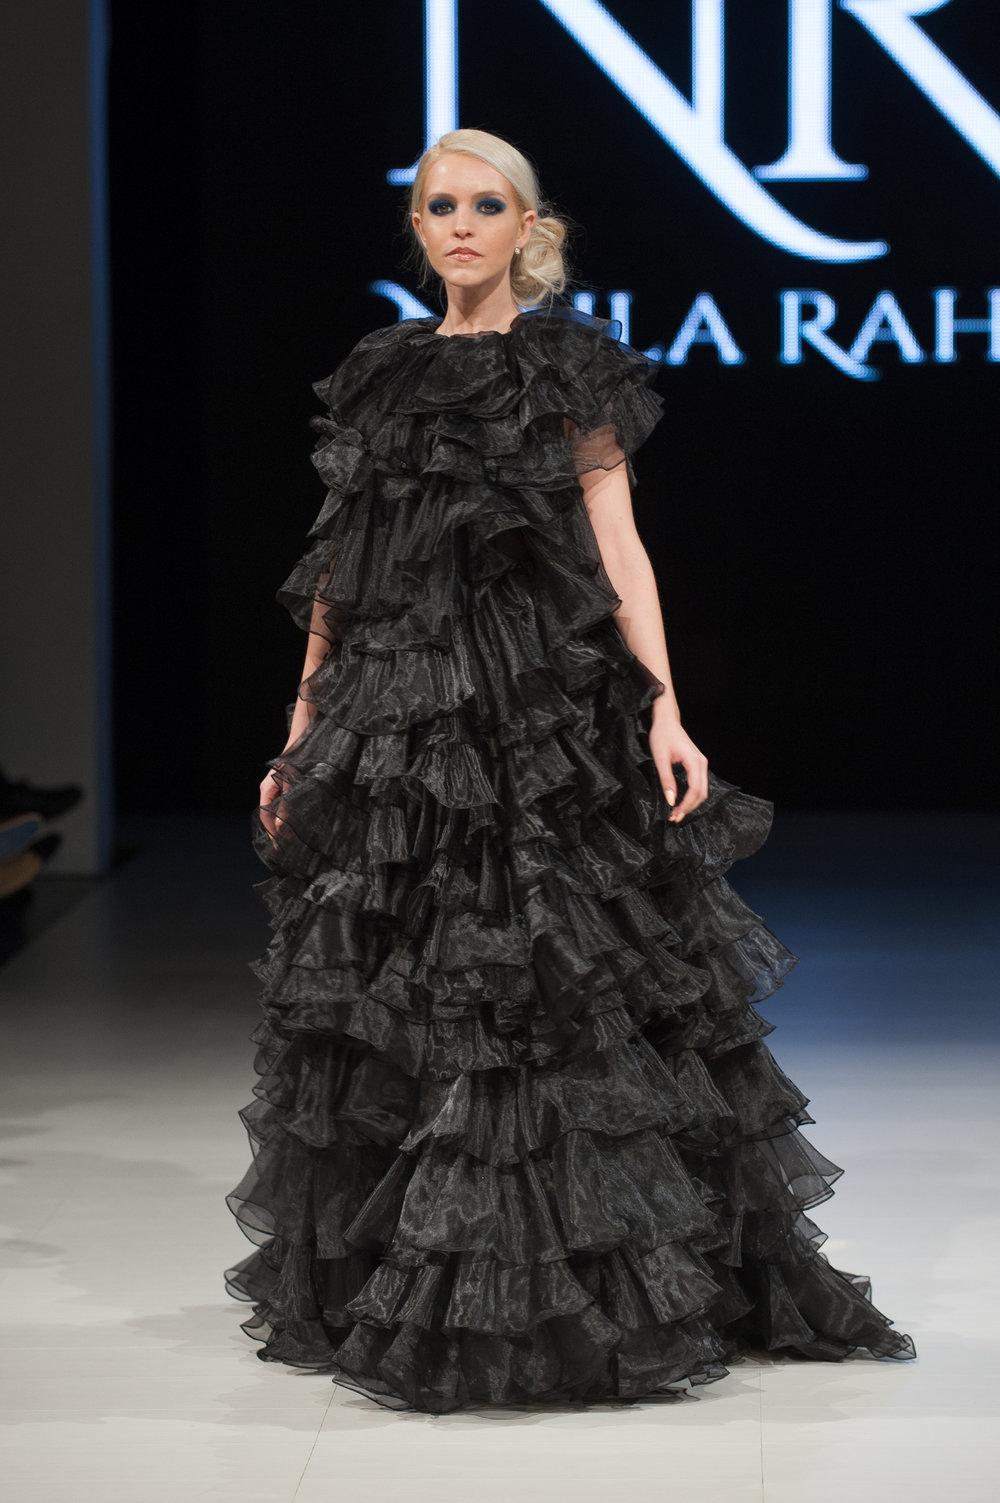 FAT2018-Day1-April17-Najla_Rahimi-Runway-Che_Rosales-LARAWAN-5853.jpg